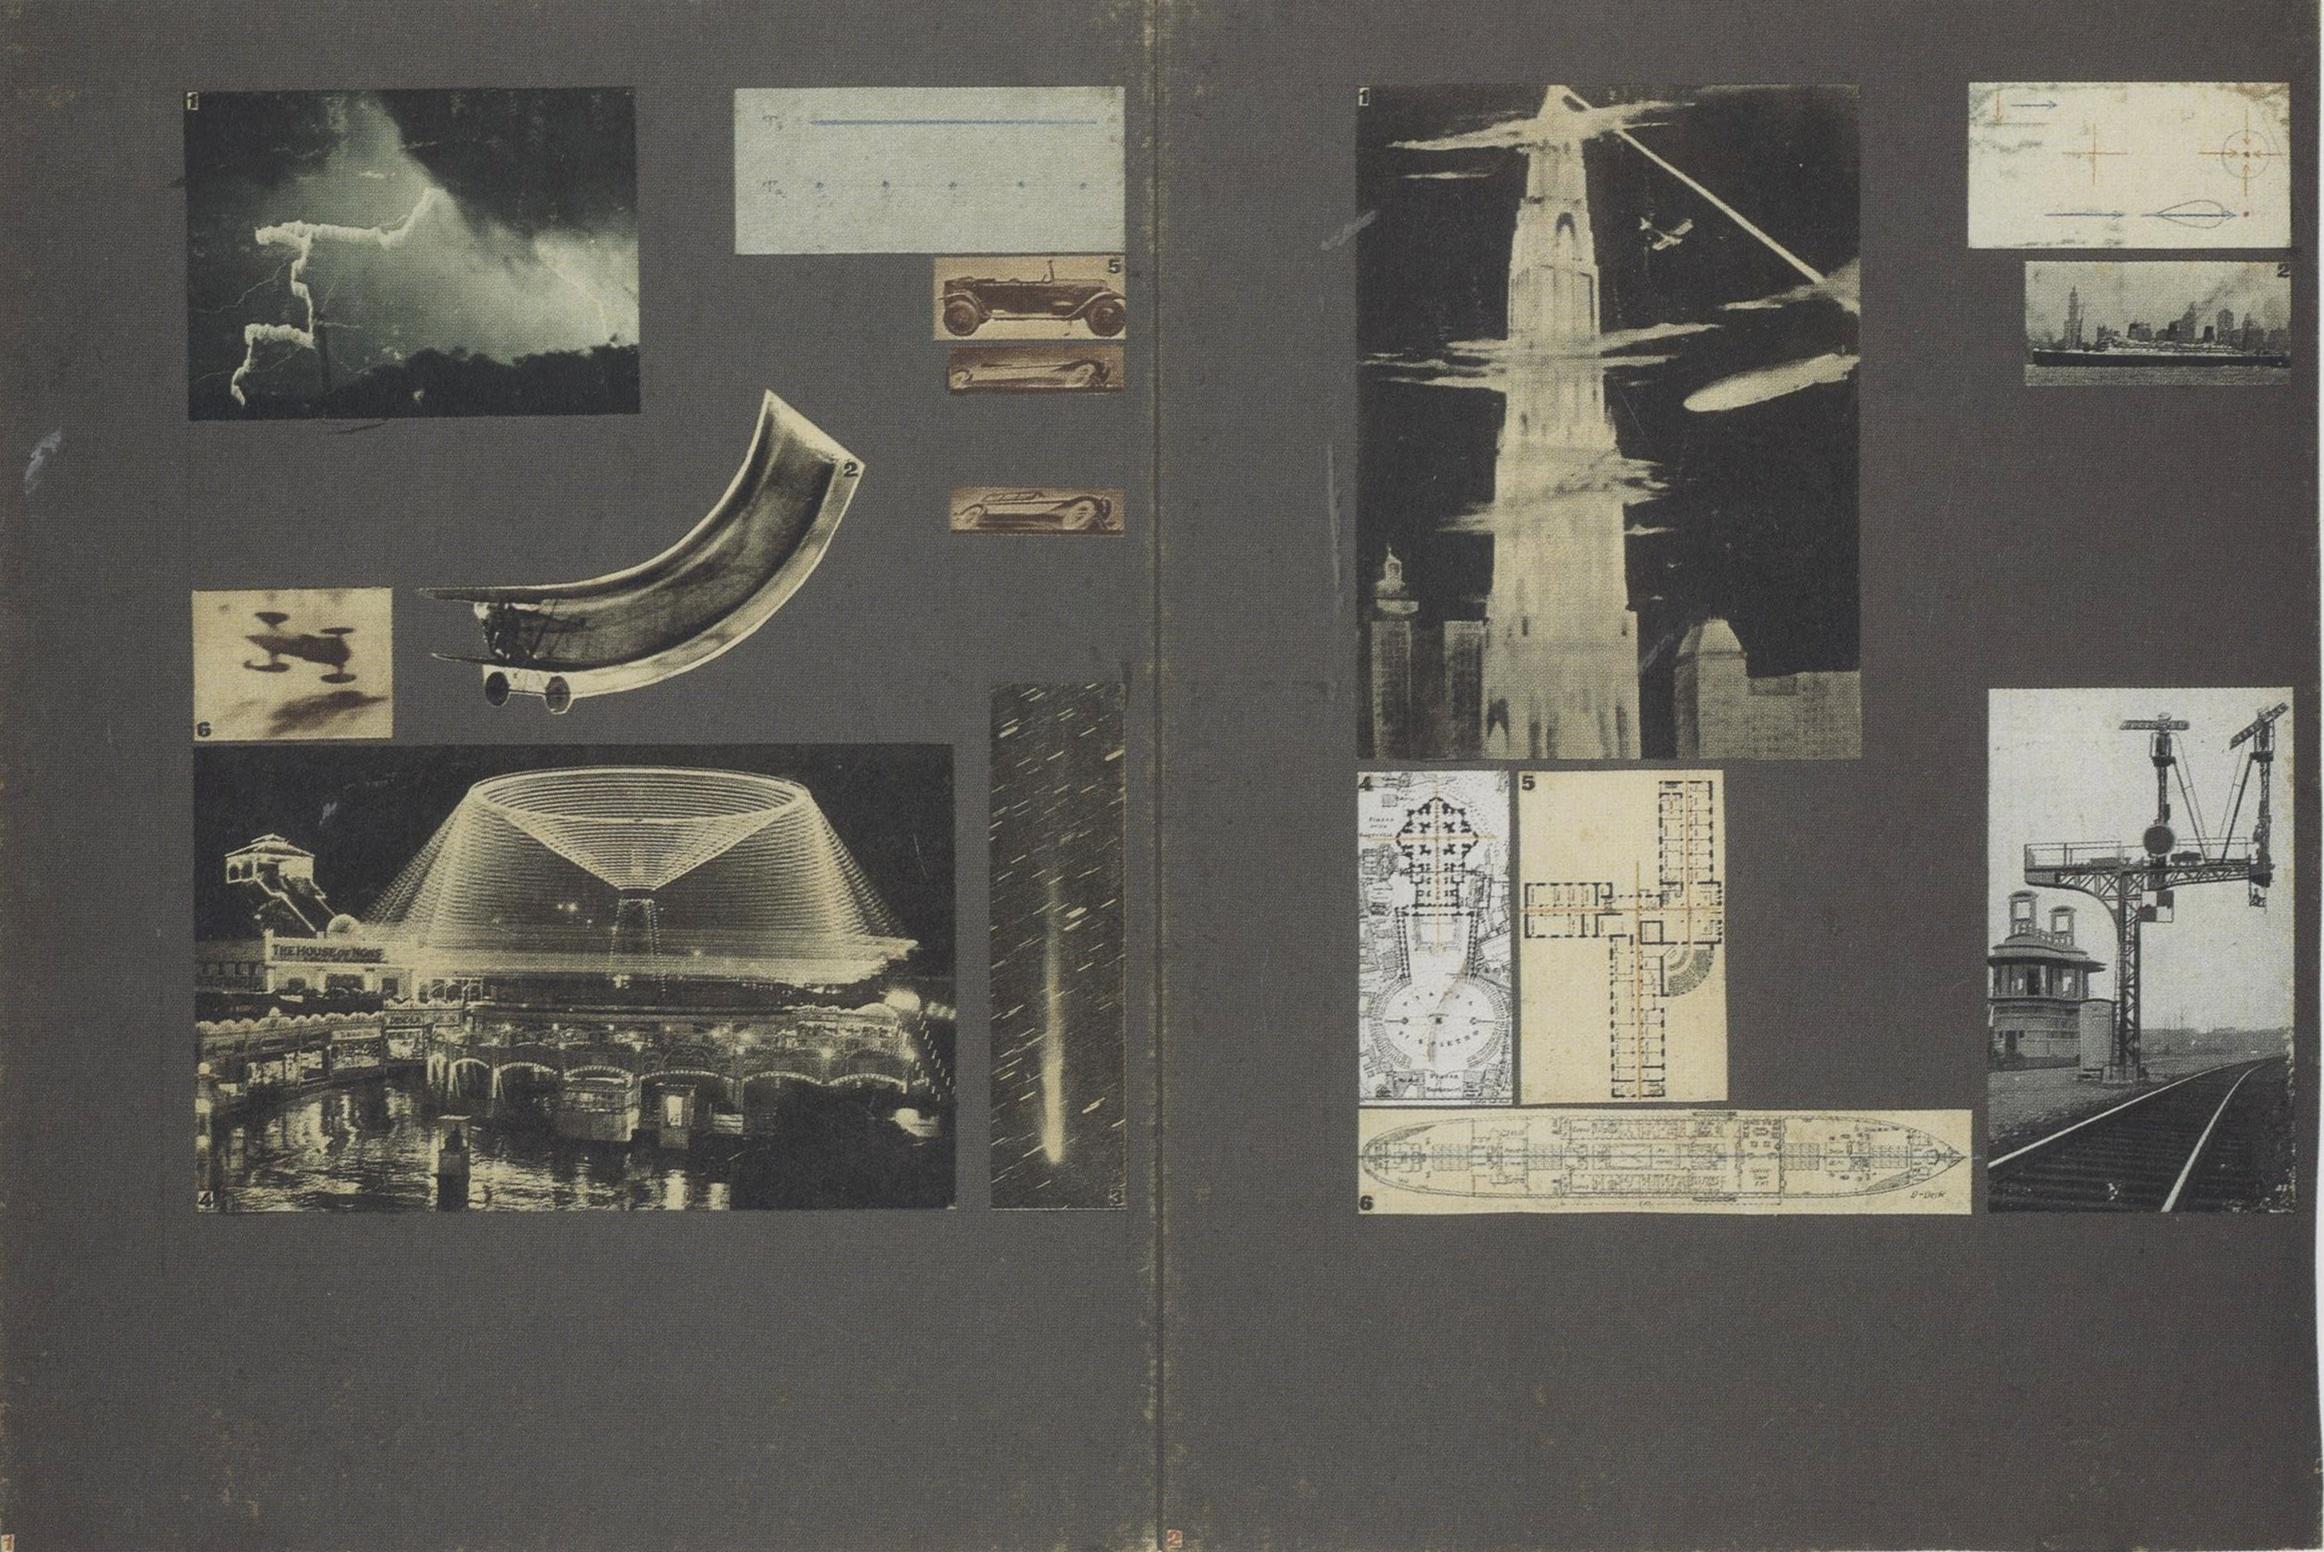 georgii krutikov diploma portfolio for the flying city  georgii krutikov diploma portfolio for the flying city 1928